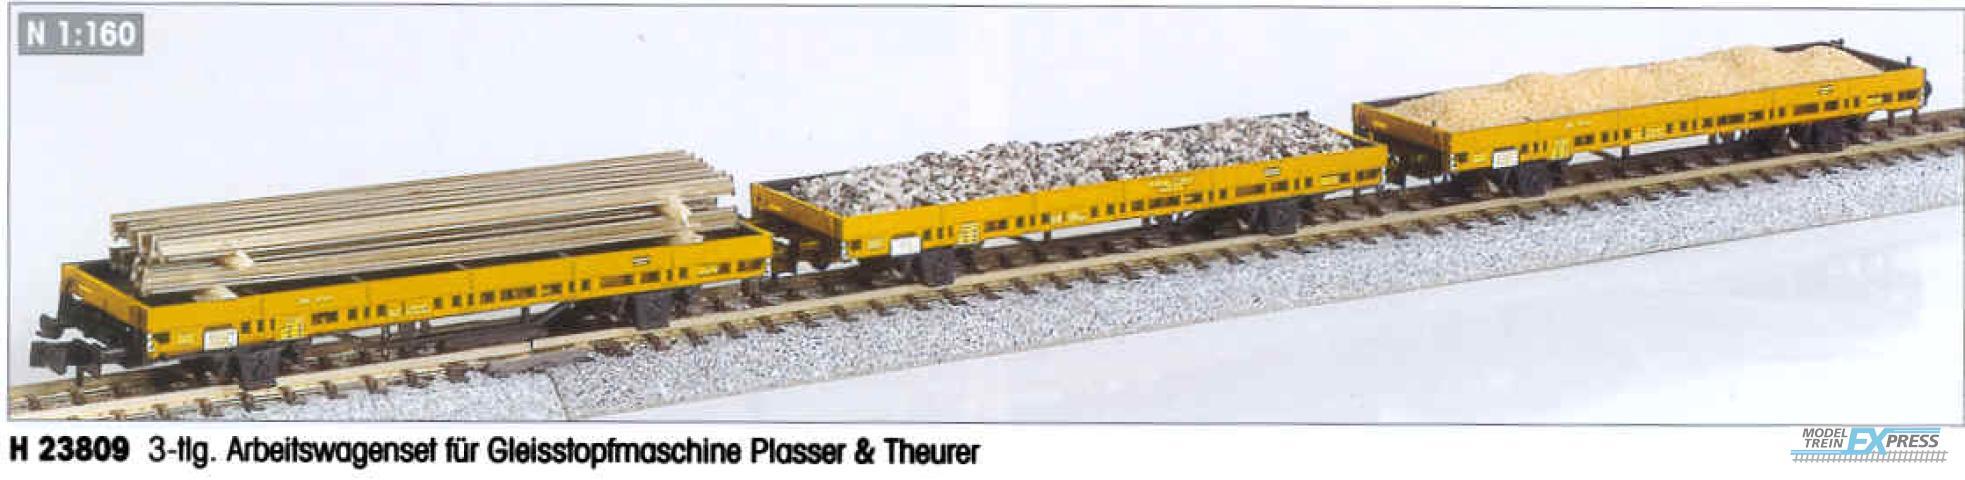 Hobbytrain 23809